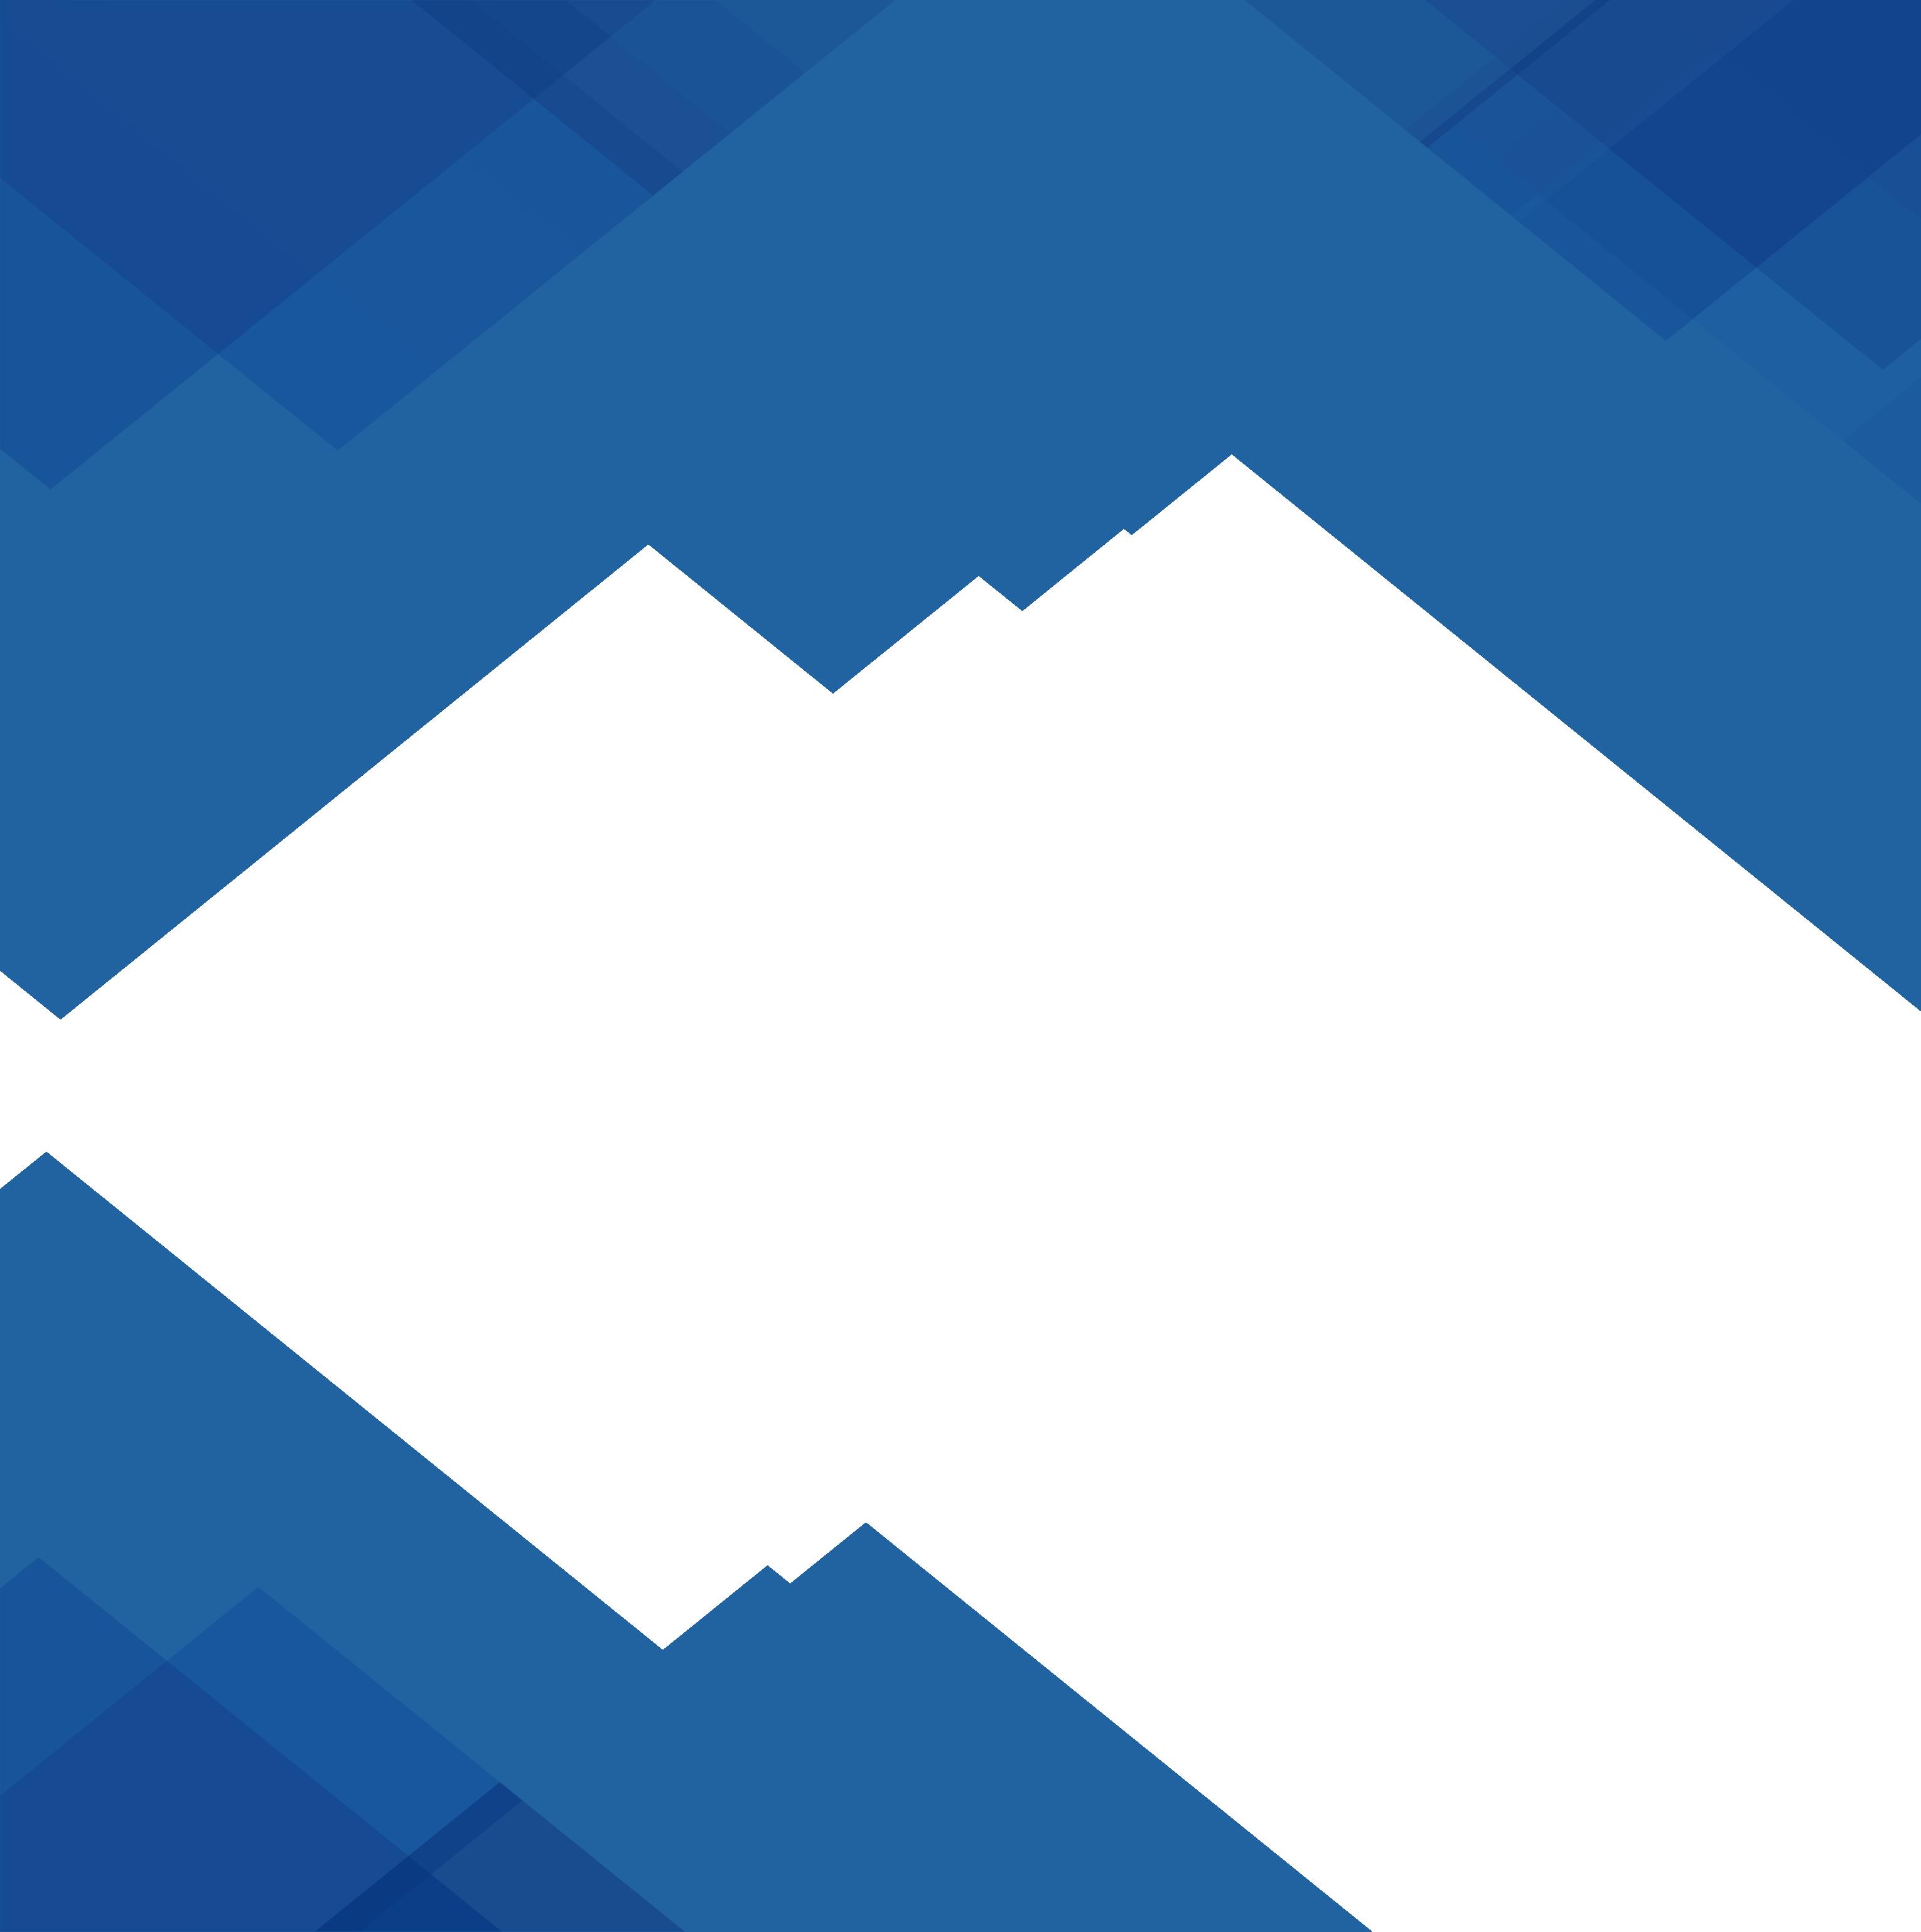 clipart royalty free Wallpaper border transprent png. Vector blue triangular